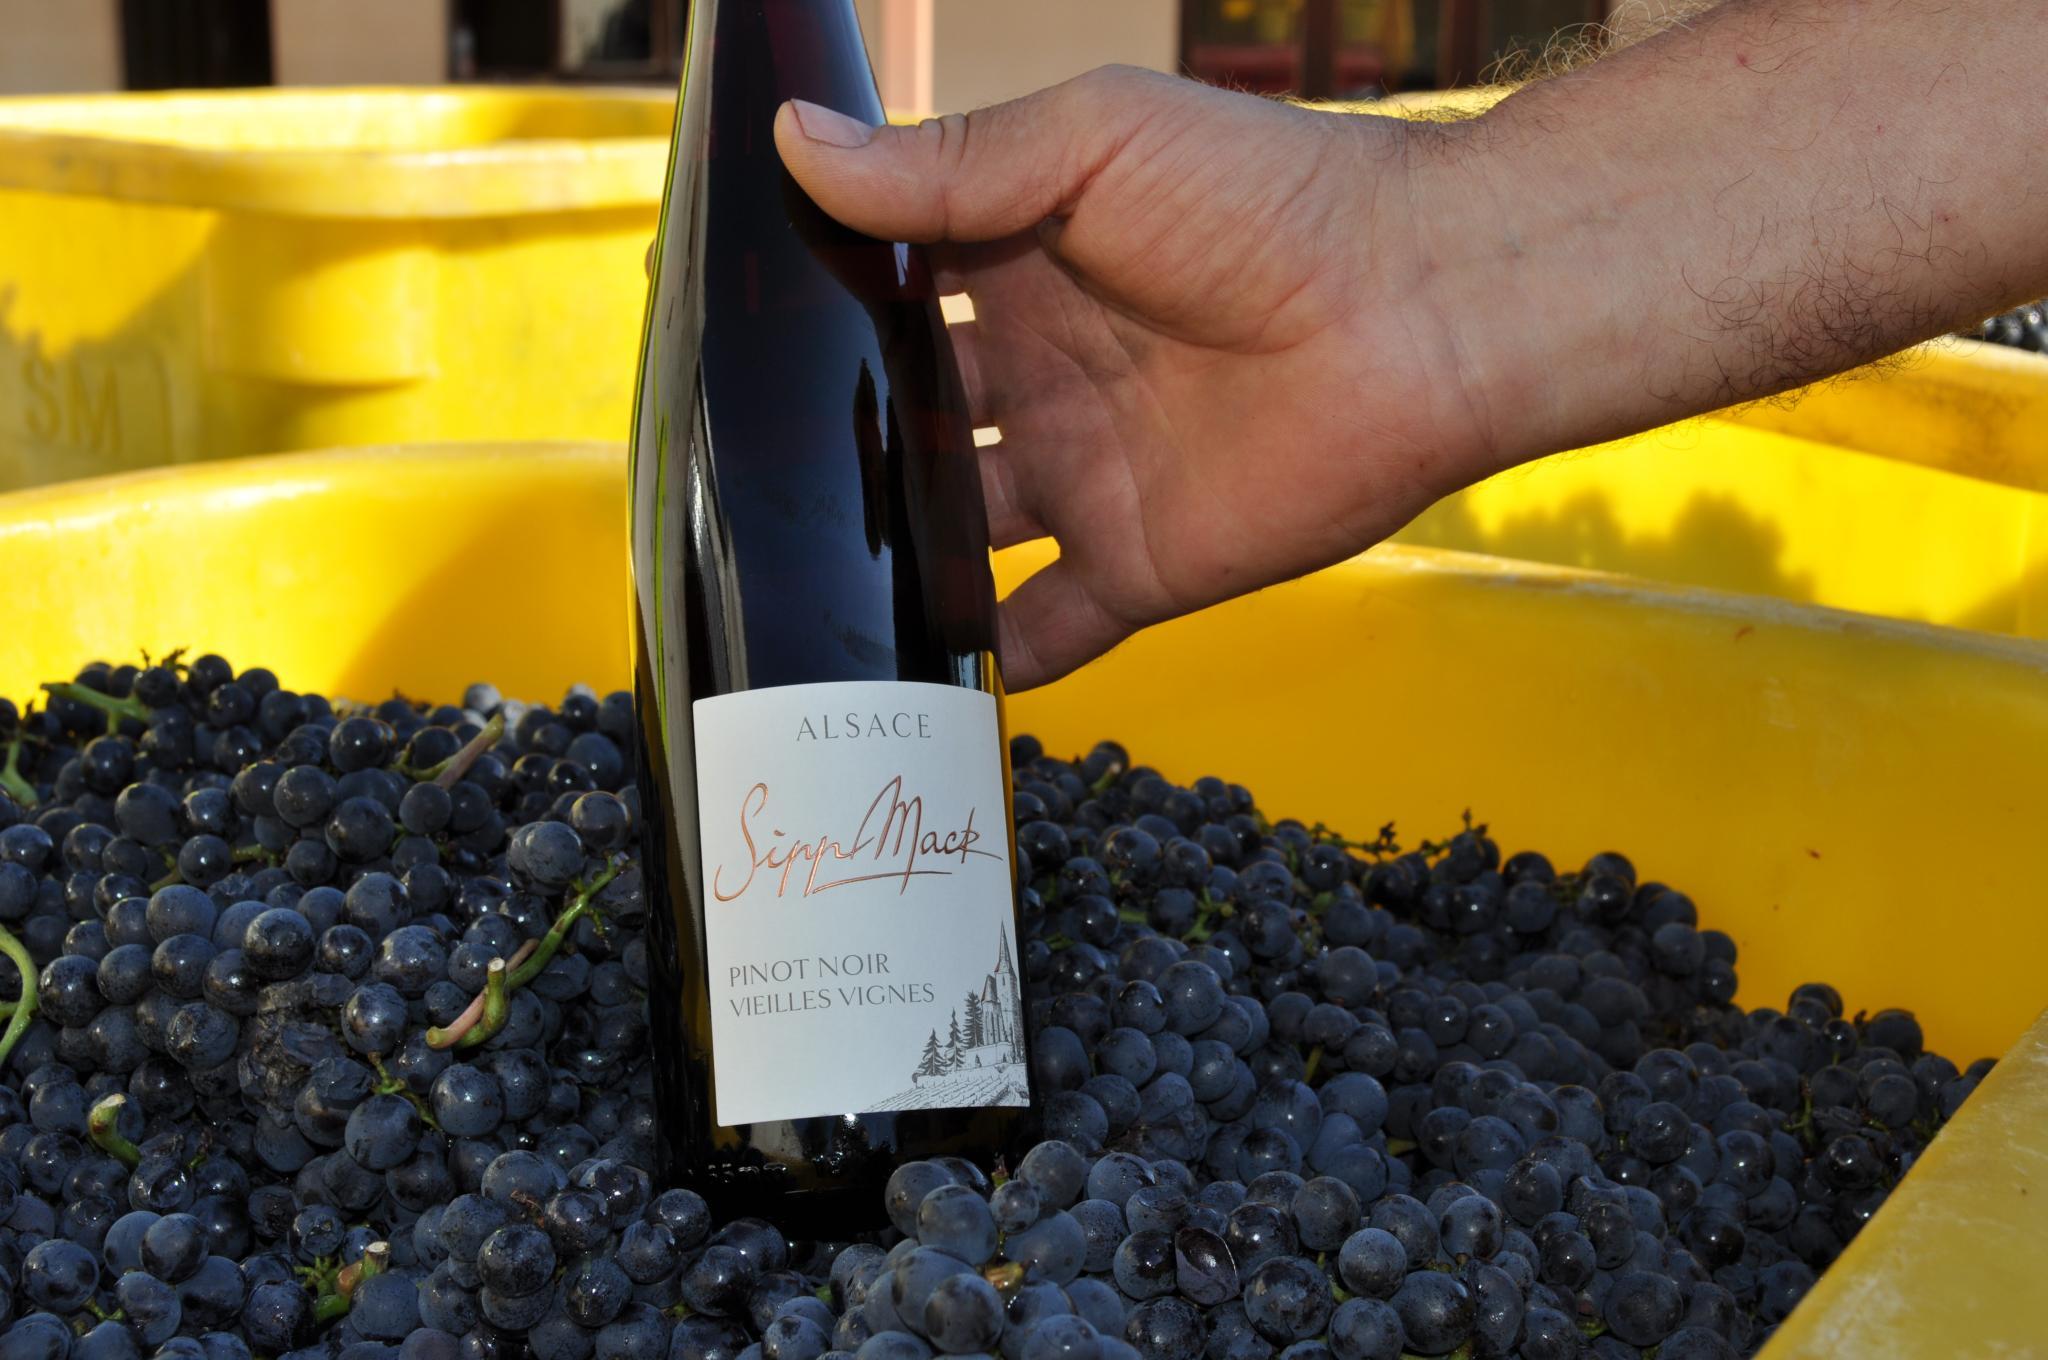 Pinot Noir Vieilles Vignes and grapes